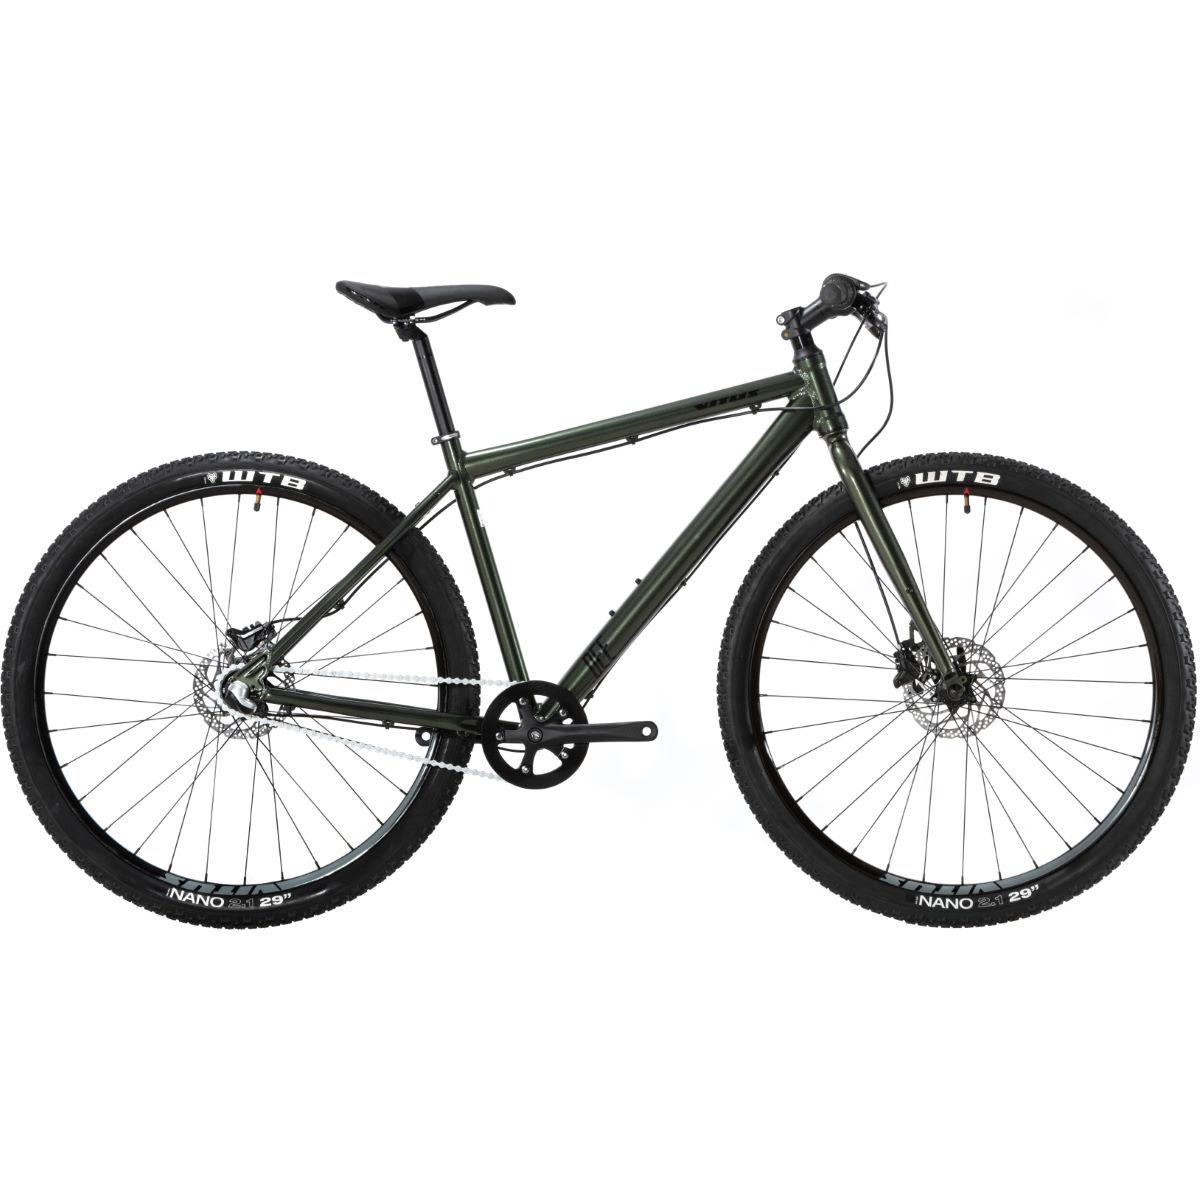 Vitus Dee VR 2019 Bikes